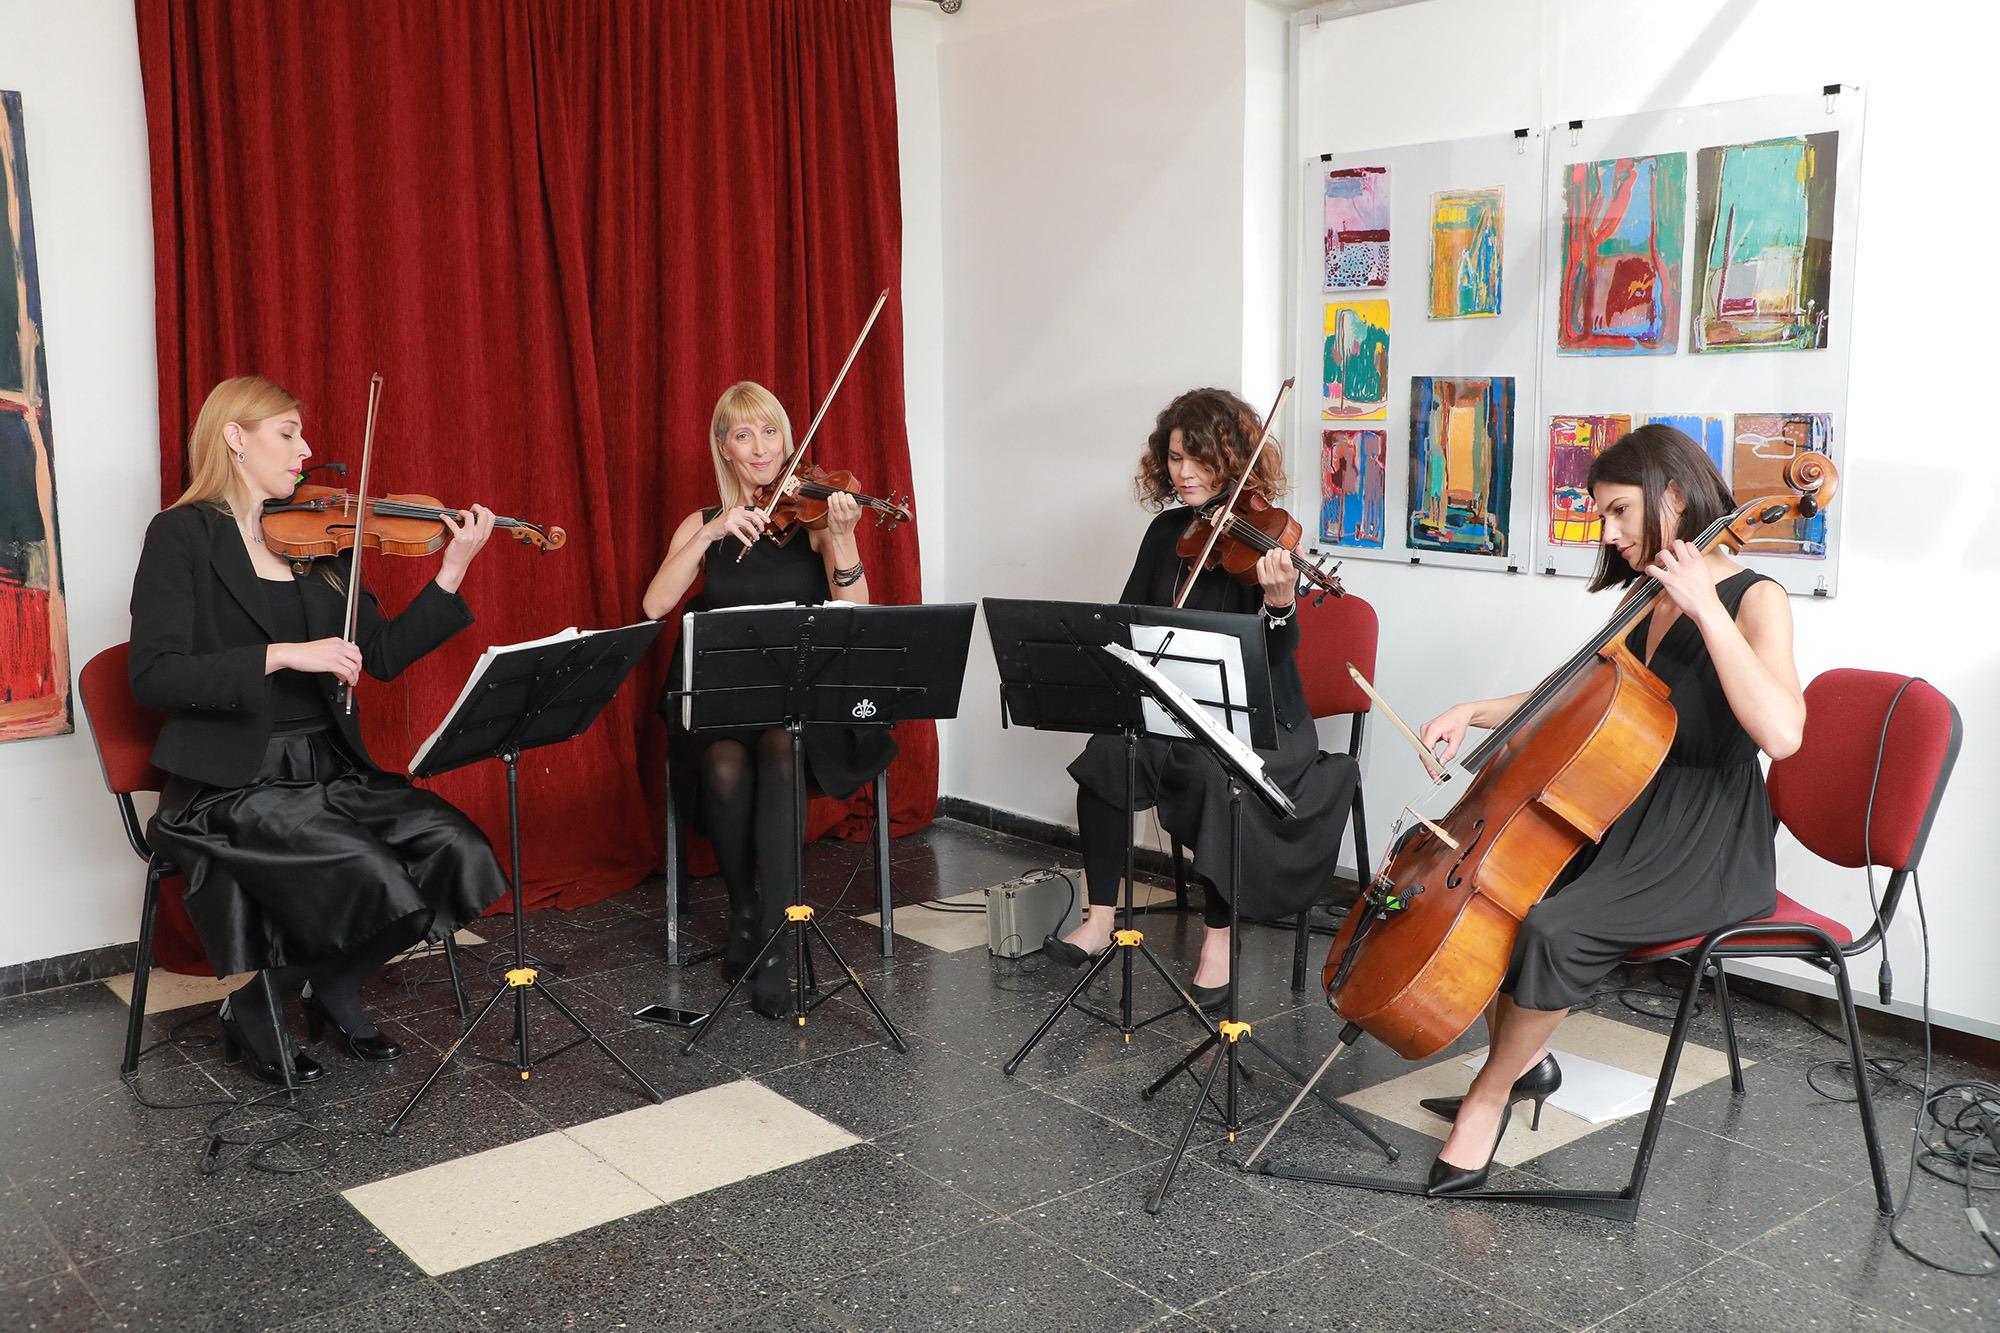 Wonder Strings kvartet Rakovica centar za kulturu slava ćirilo i metodije